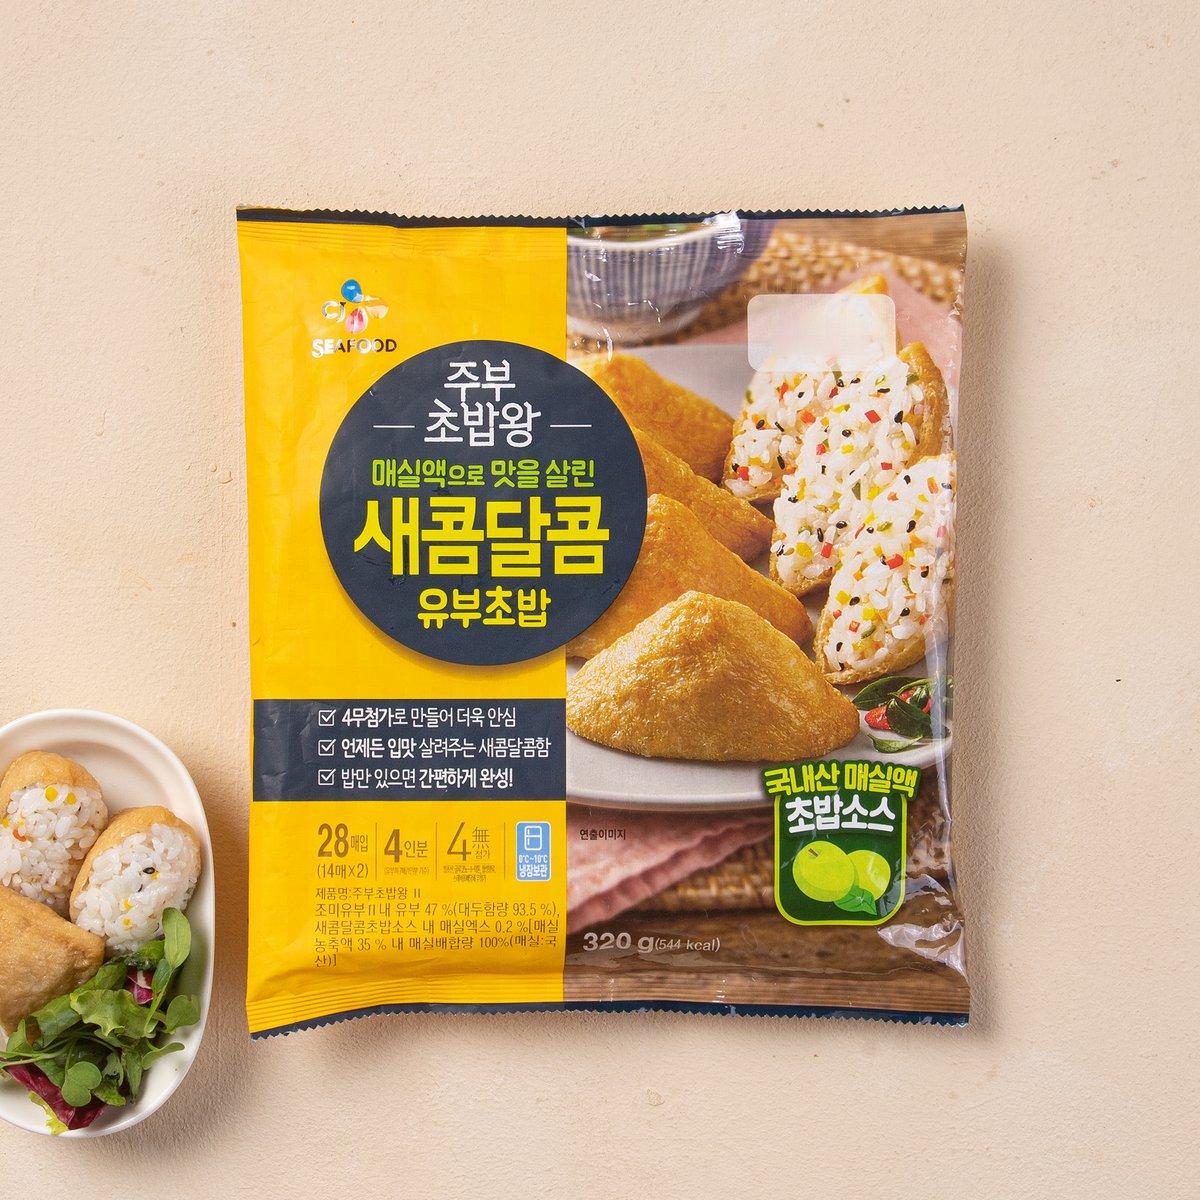 [CJ] 주부초밥왕 새콤달콤유부초밥 패밀리세트 320G